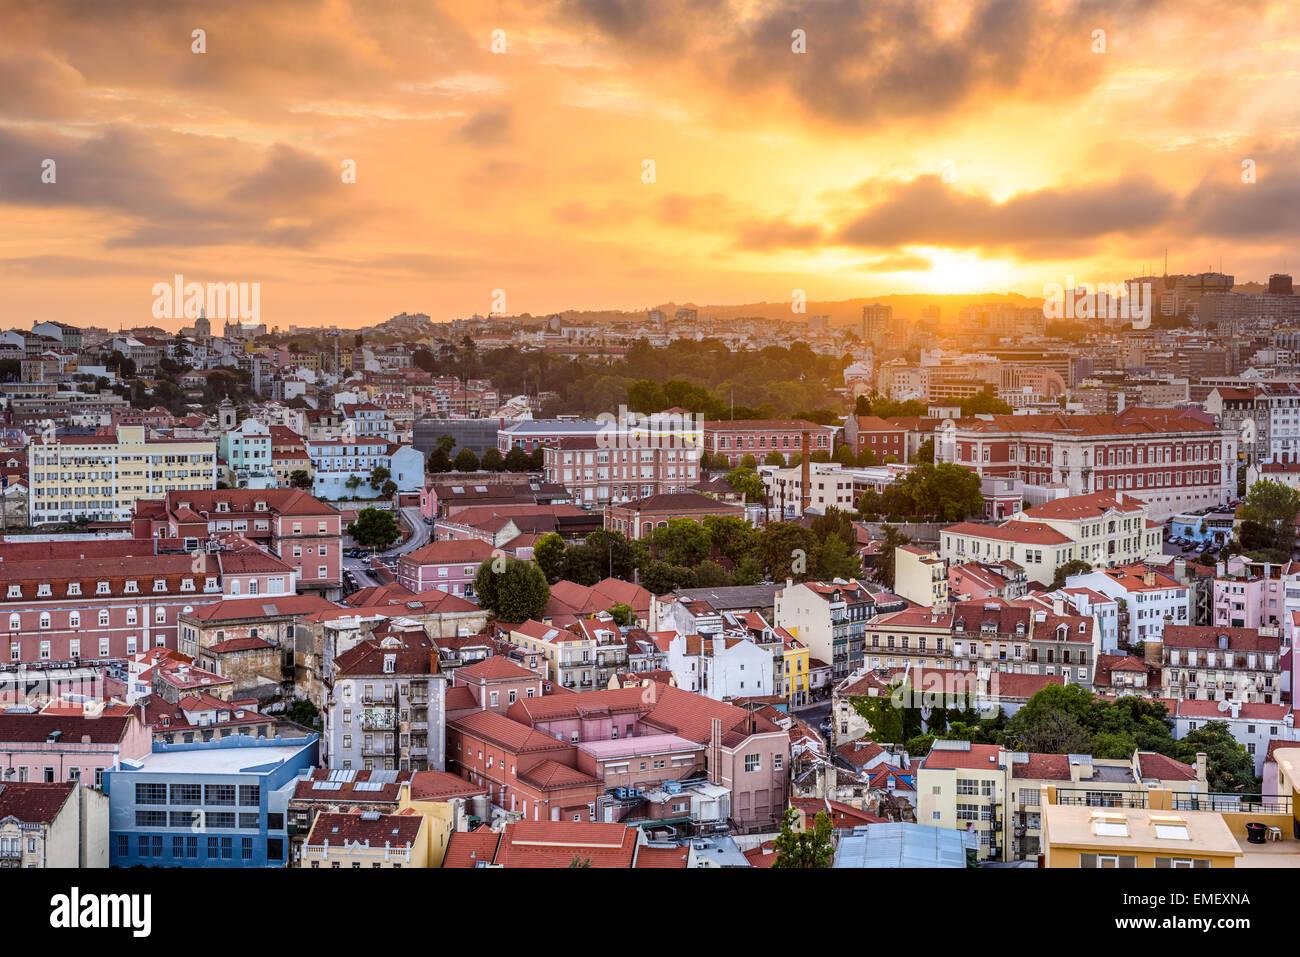 Lisboa, Portugal paisaje urbano durante el atardecer. Imagen De Stock